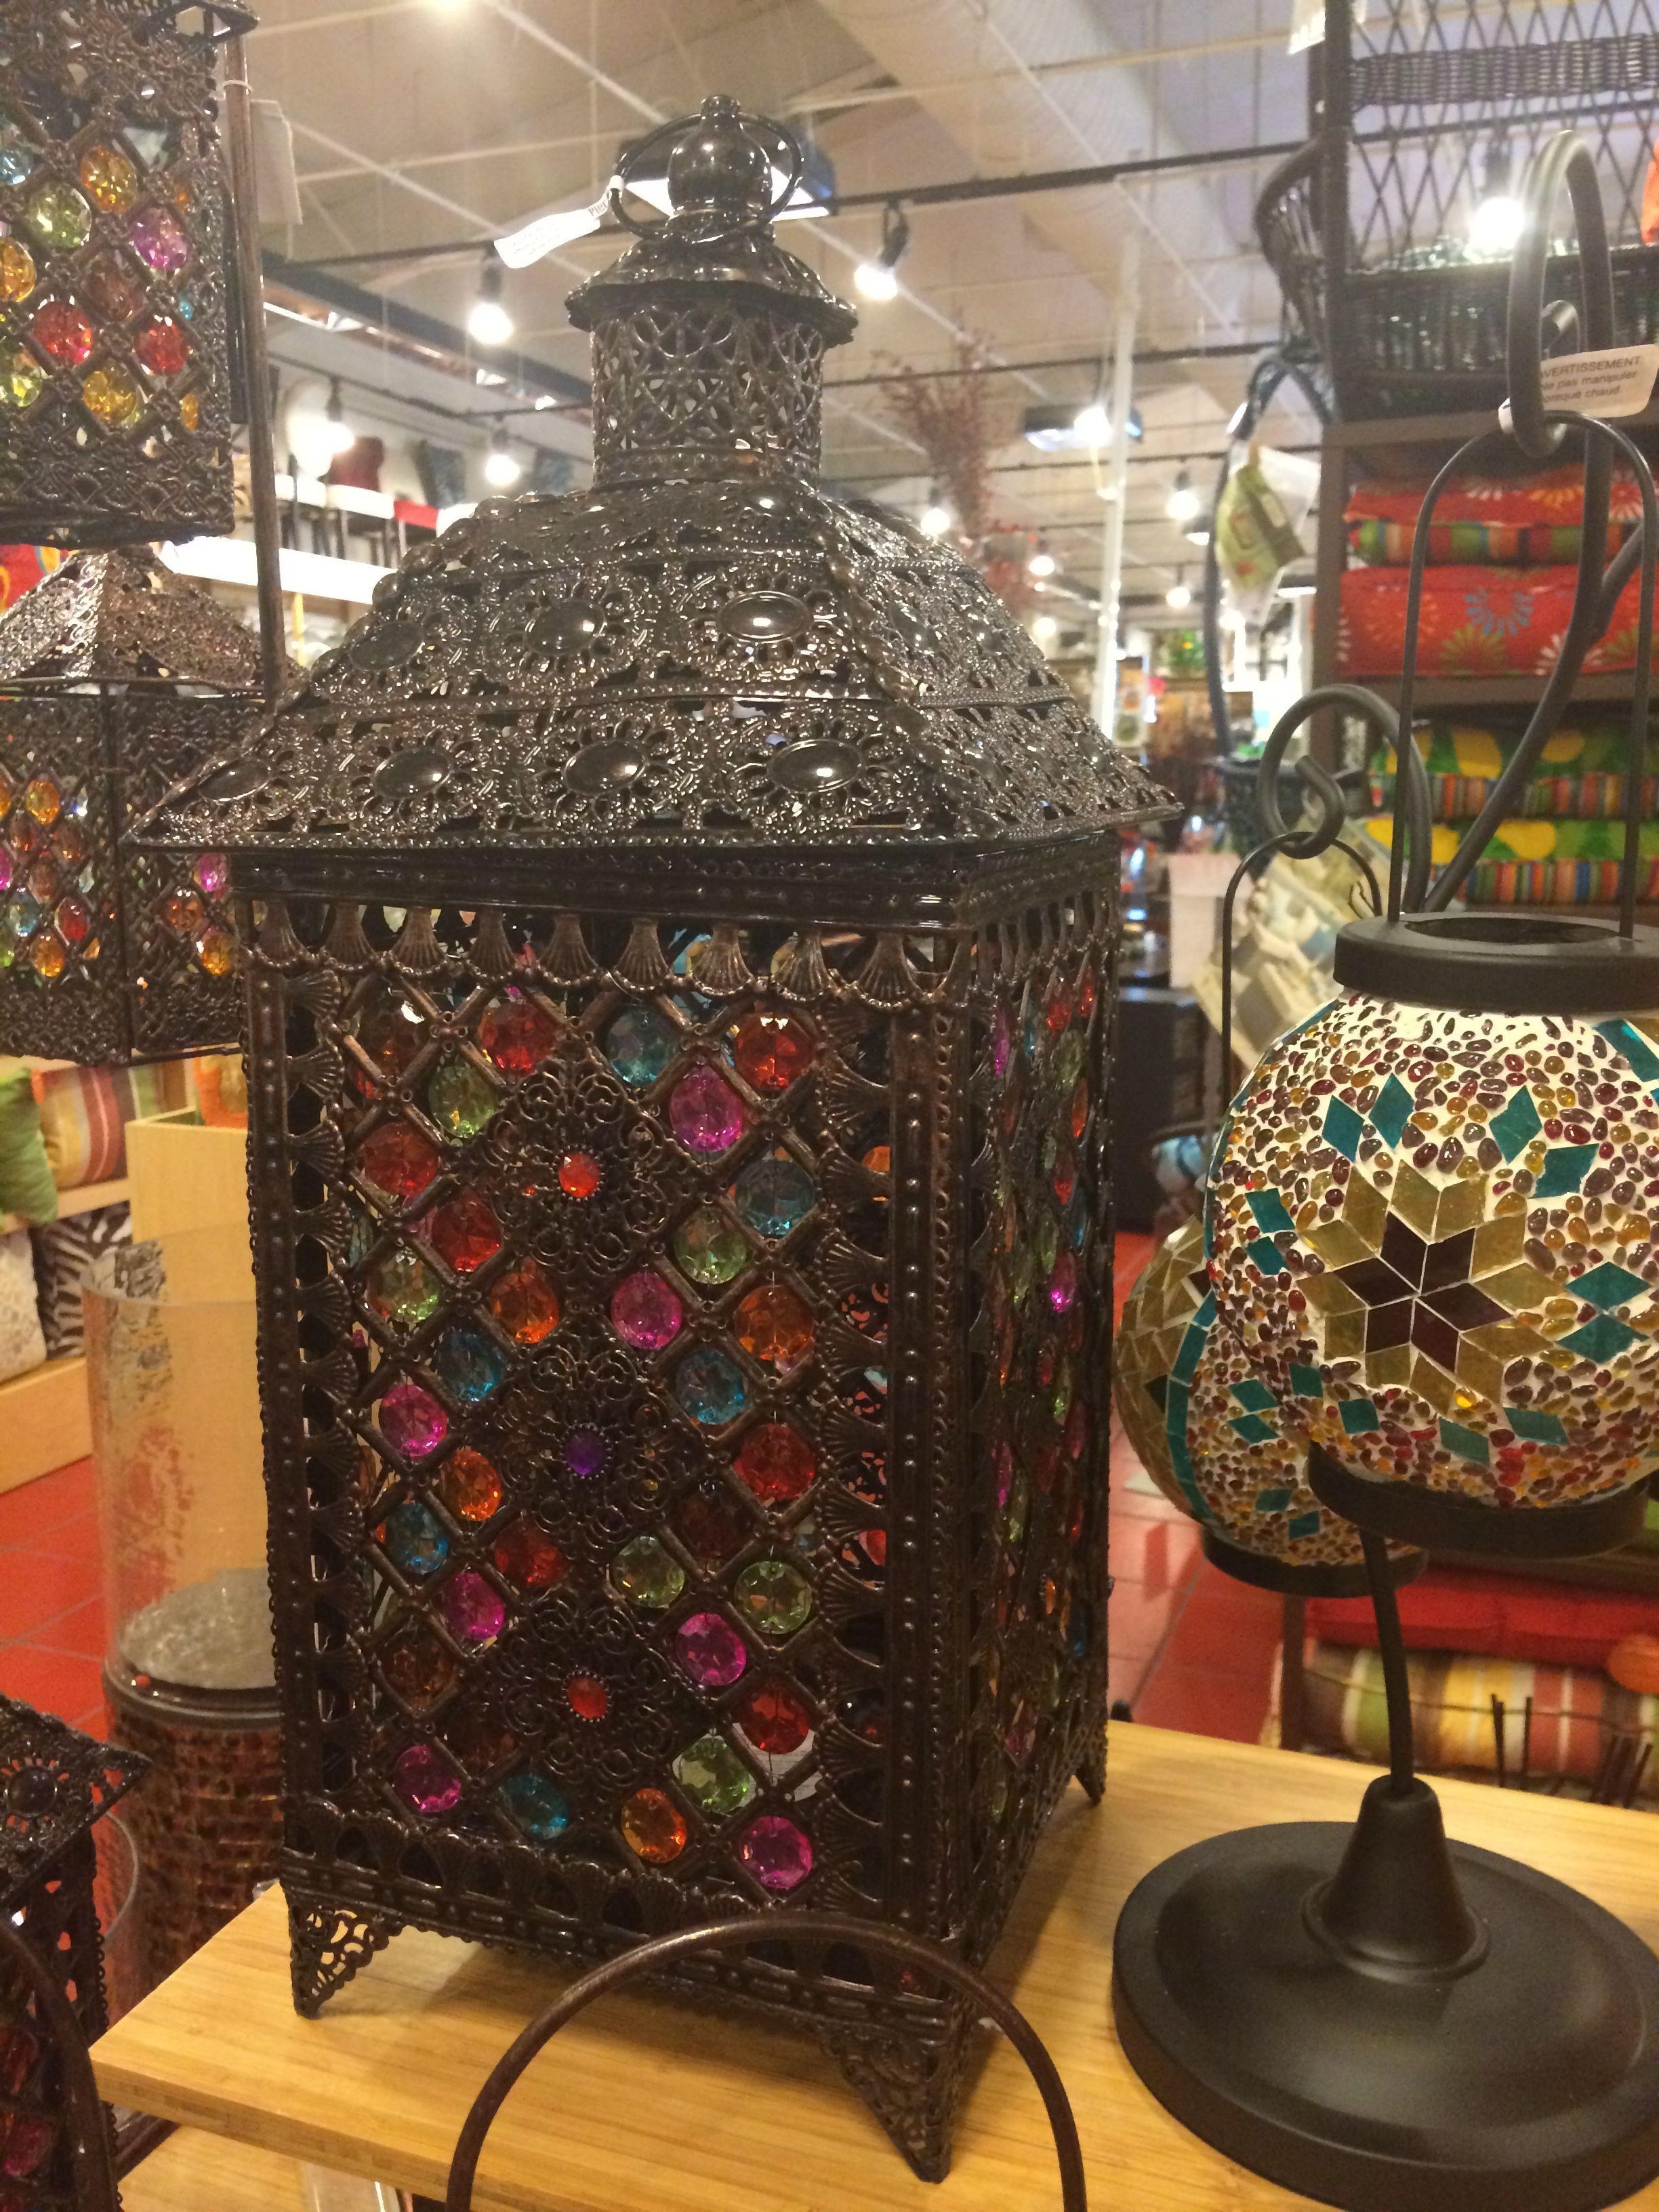 Found moroccan jeweled lantern for decor for jewish henna at pier found moroccan jeweled lantern for decor for jewish henna at pier one imports henna arubaitofo Gallery